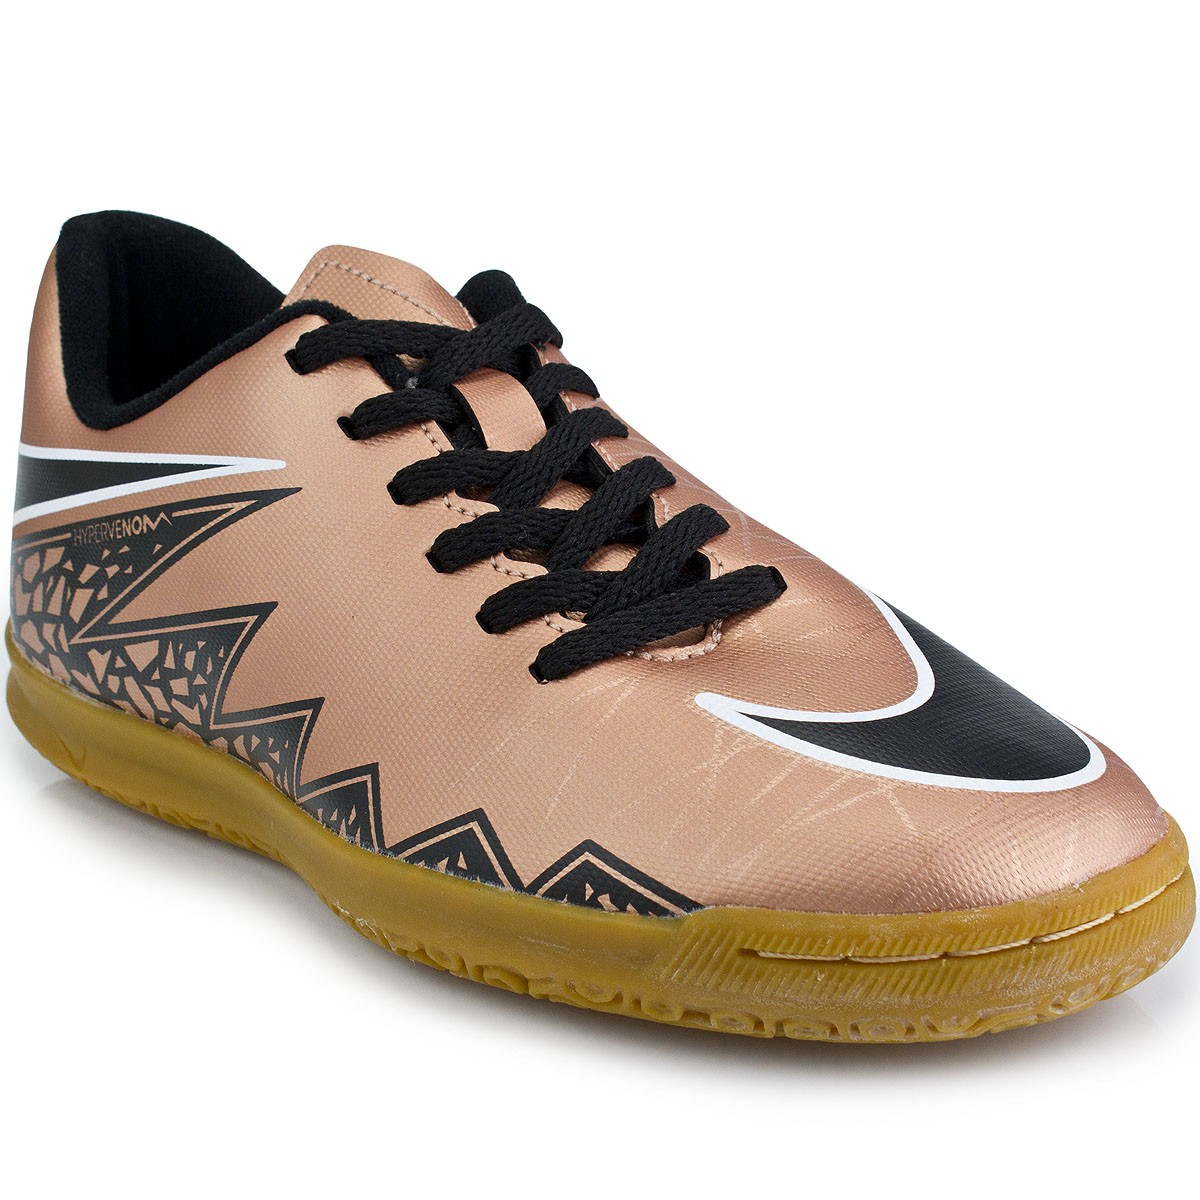 5ee9456bce224 Chuteira Nike Hypervenom Phade II IC Jr | Futsal | MaxTennis